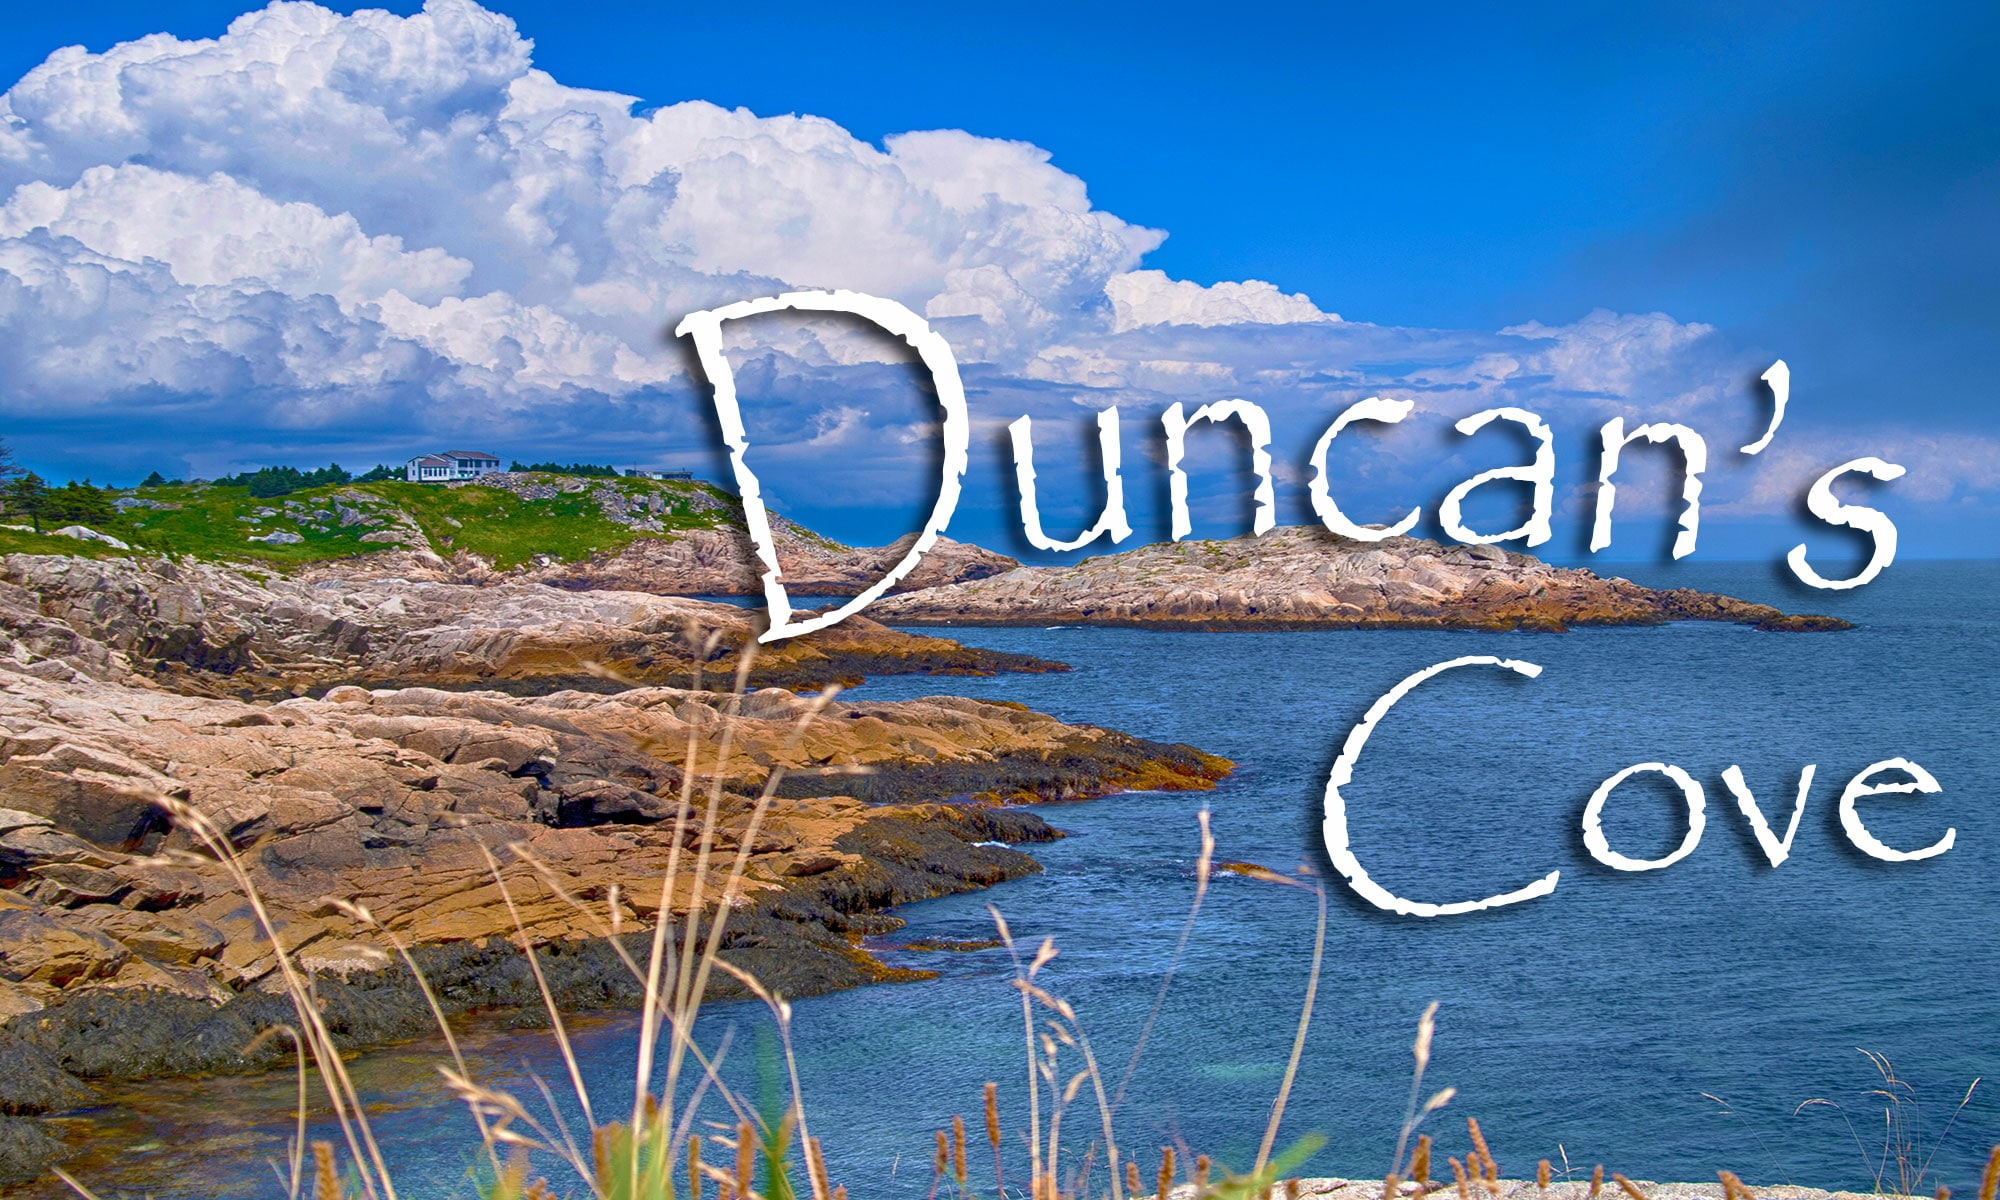 Duncan's Cove Photos